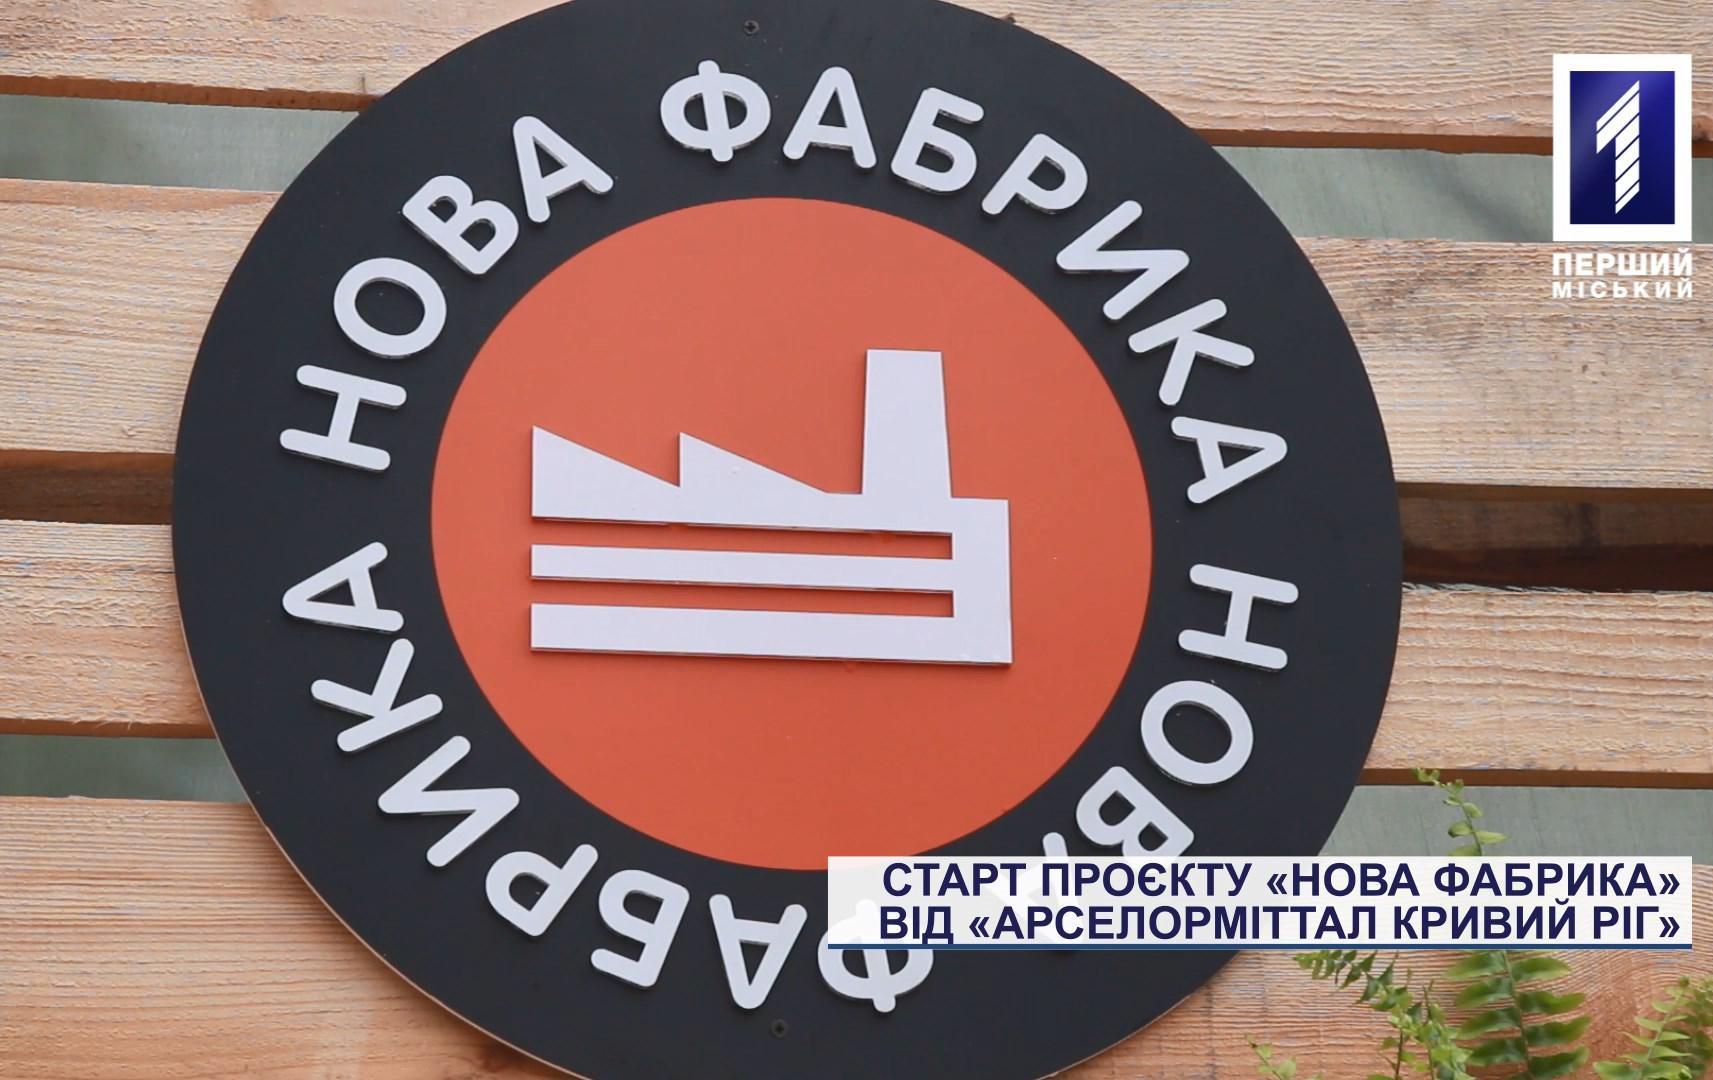 Спецрепортаж: старт проекта «Новая фабрика» от «АрселорМиттал Кривой Рог»